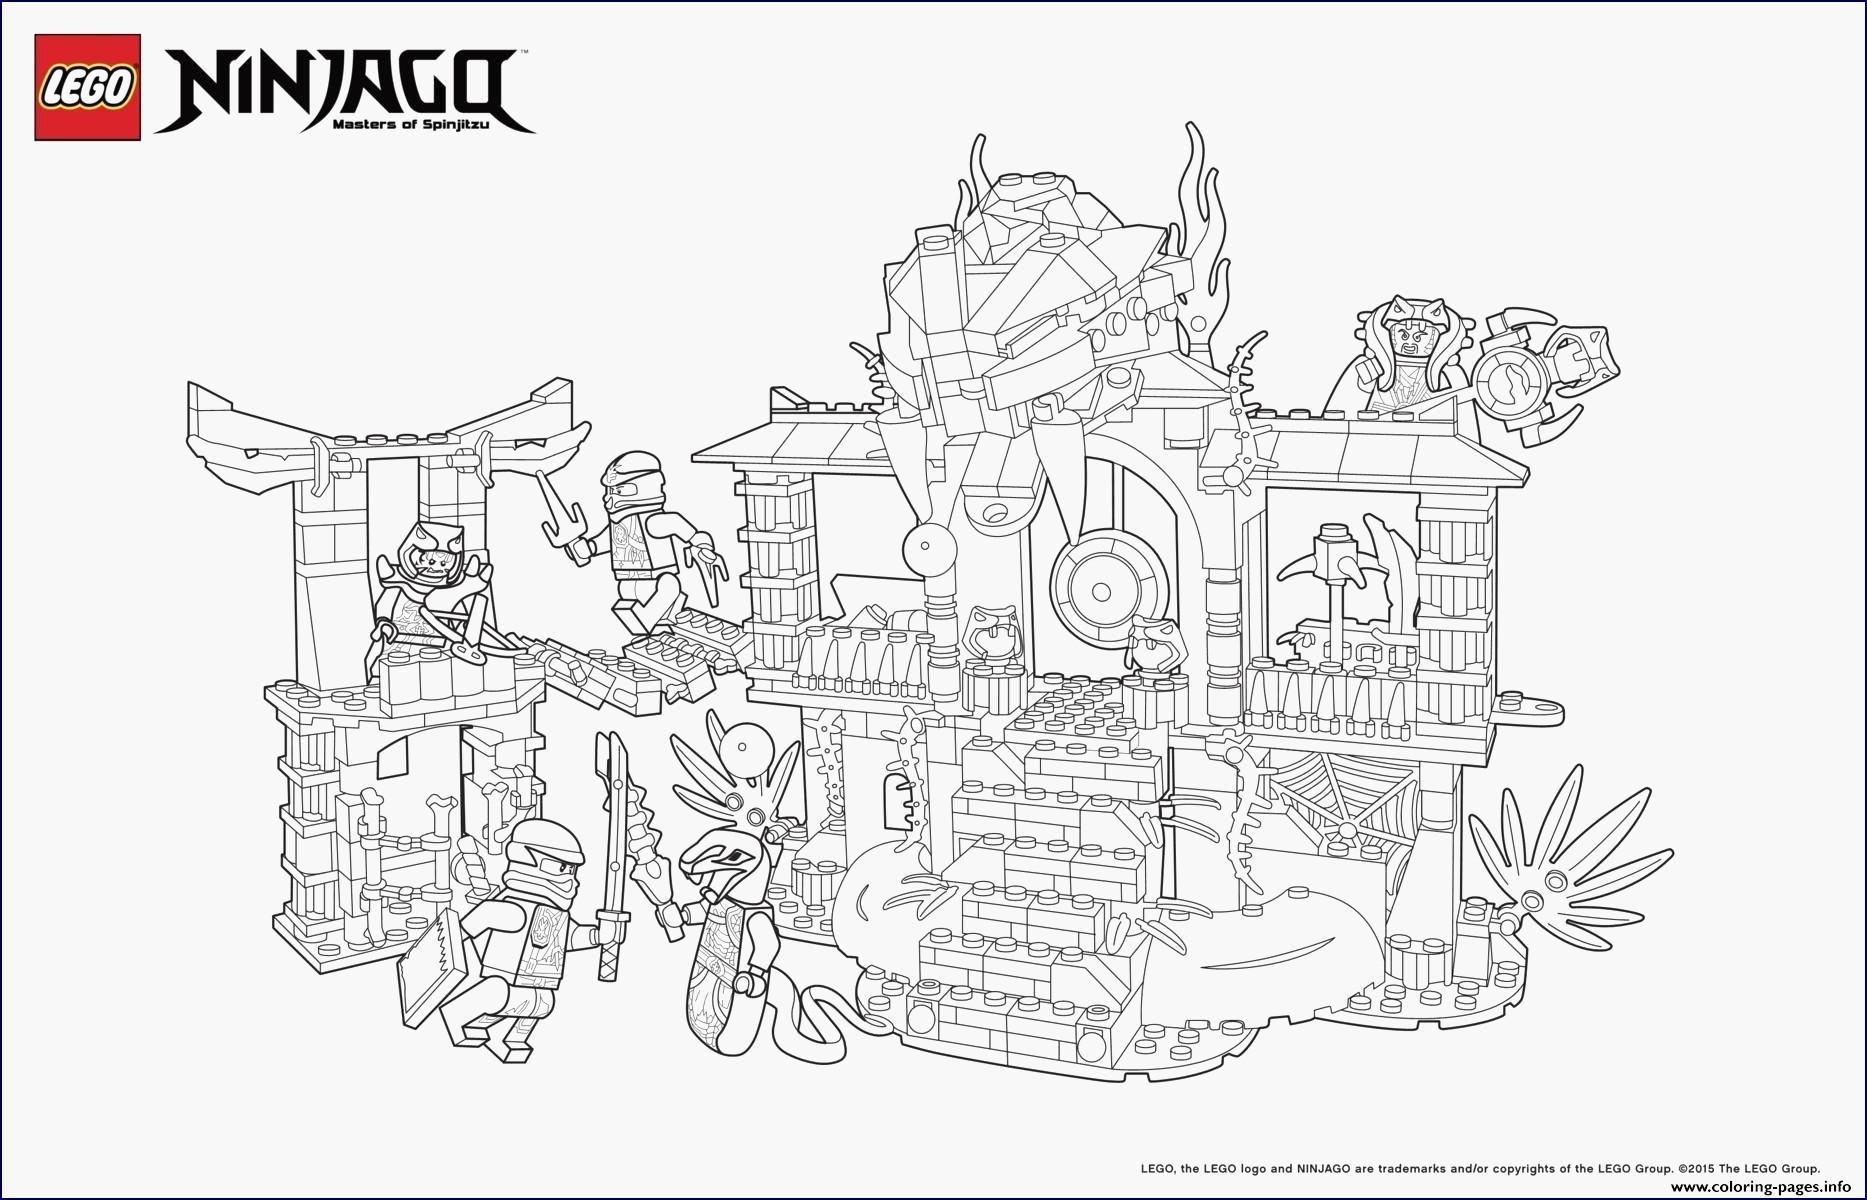 Ninjago Lego Ausmalbilder Genial Titan Masters Elegant Bmw X3 2 0d 38b64a05 S – the Best Sport Das Bild